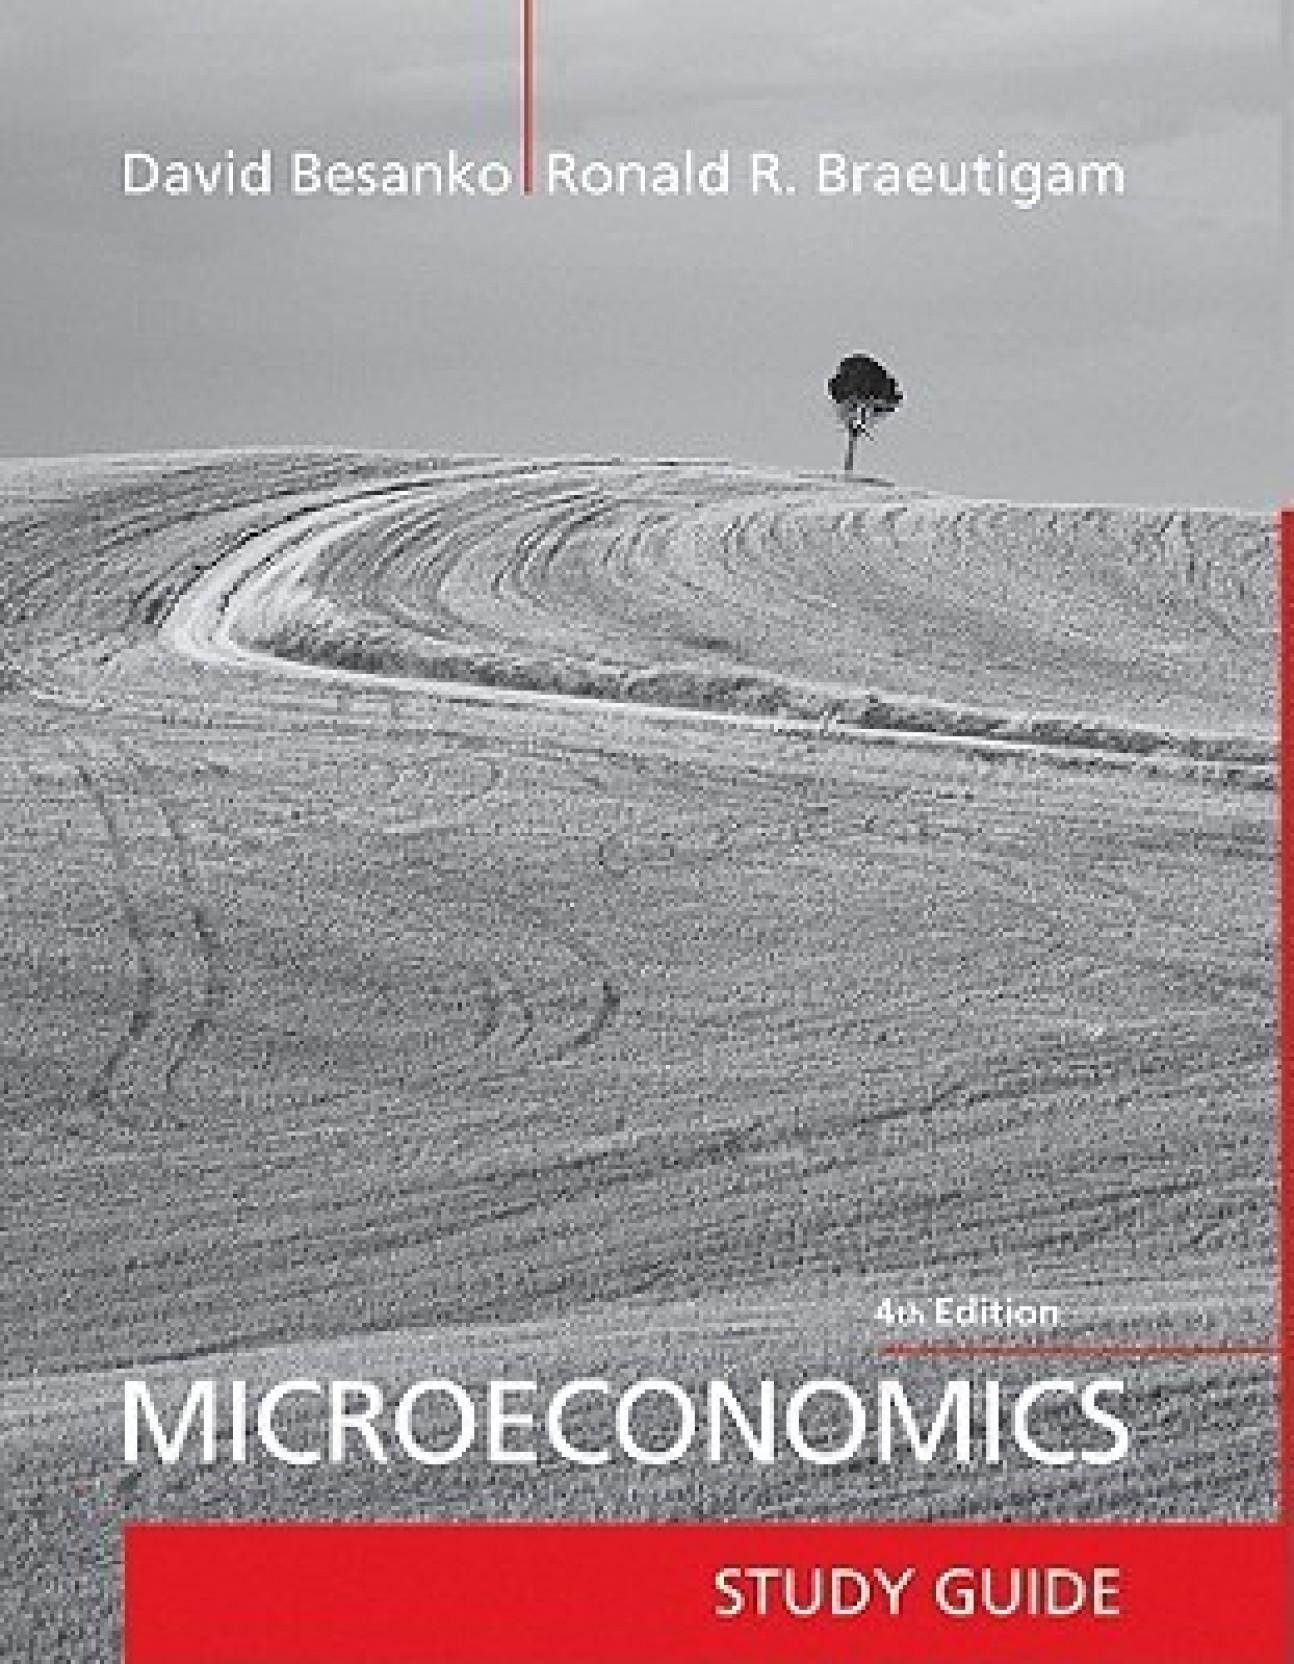 Microeconomics Study Guide. Share